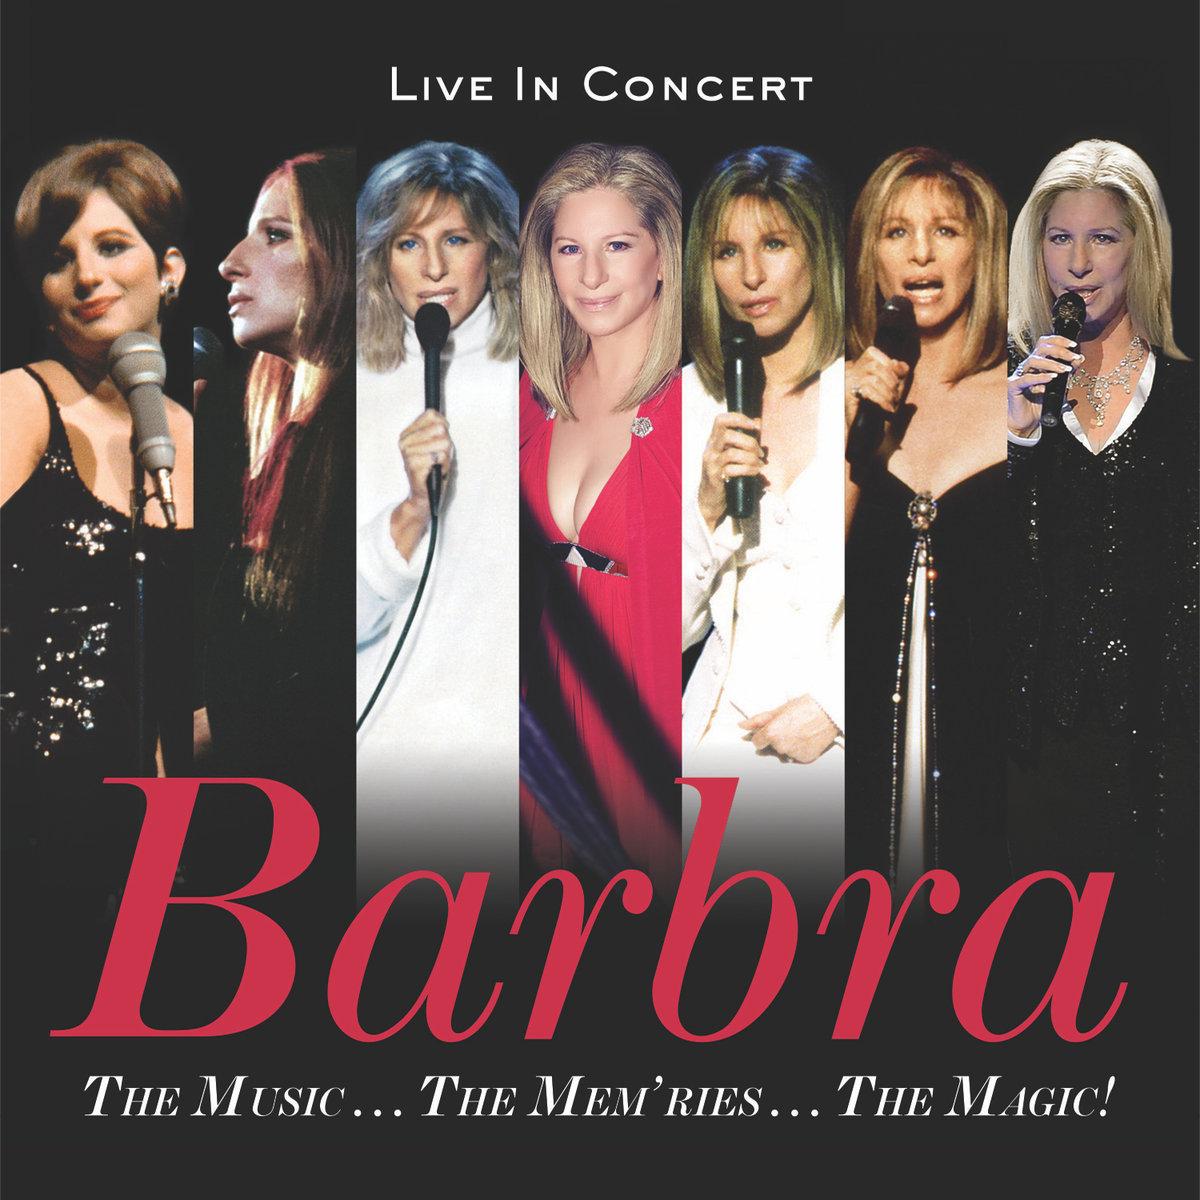 Streisand Barbra – The Music…